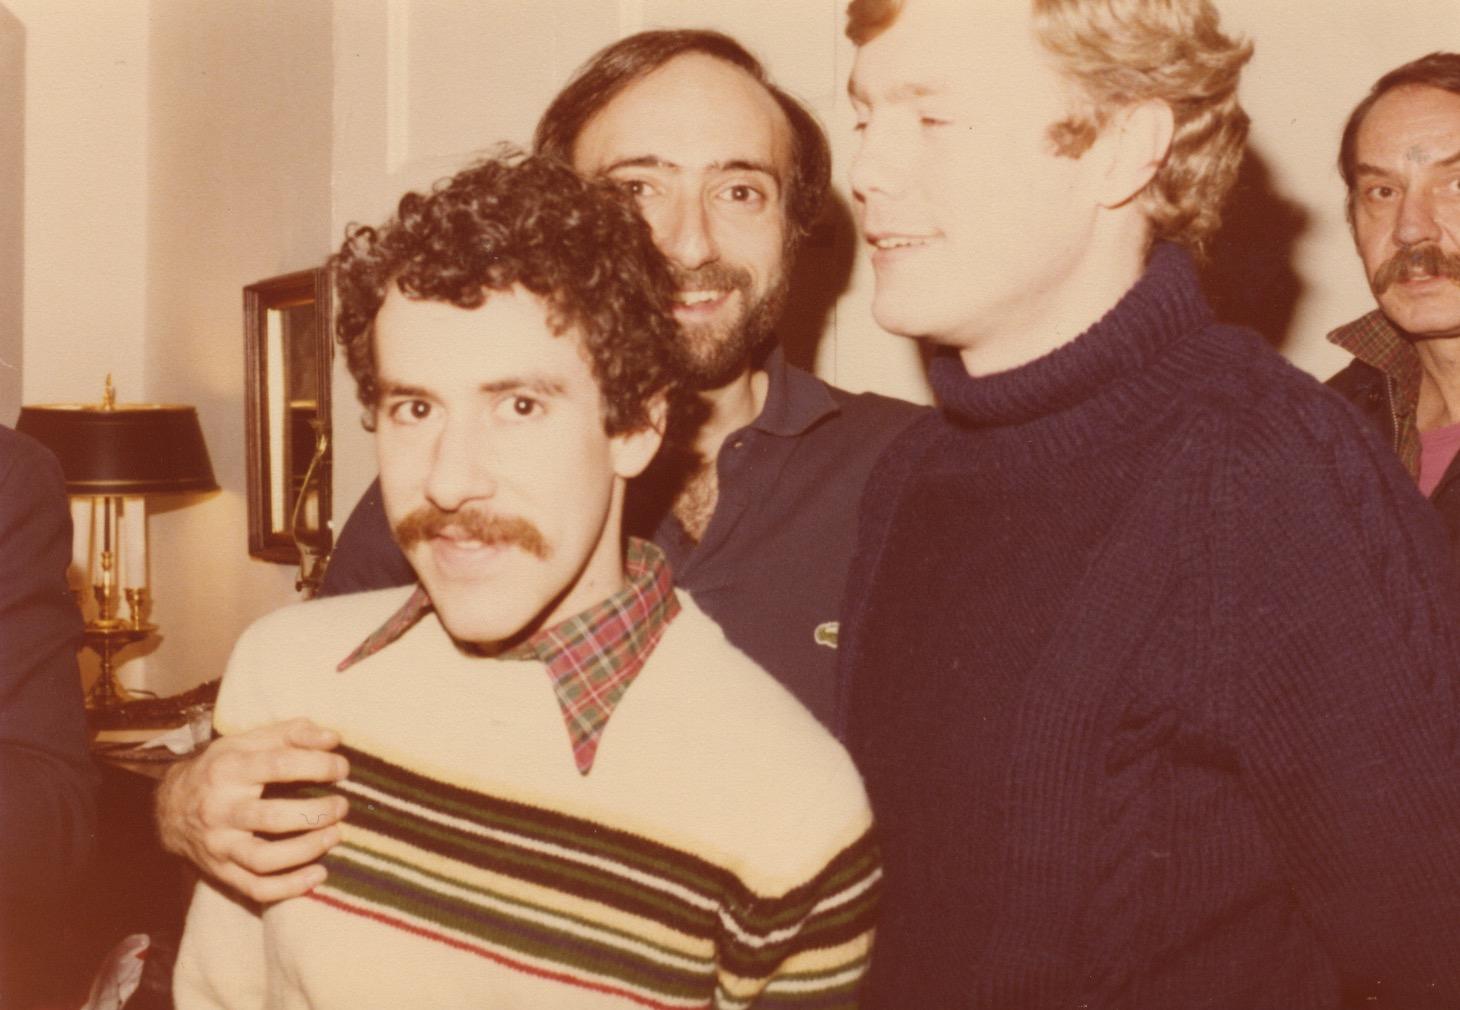 Identity House friends: Bill Wilson, Dan Bloom and Steve Finestein in 1980. Image courtesy of Lee Zevy.